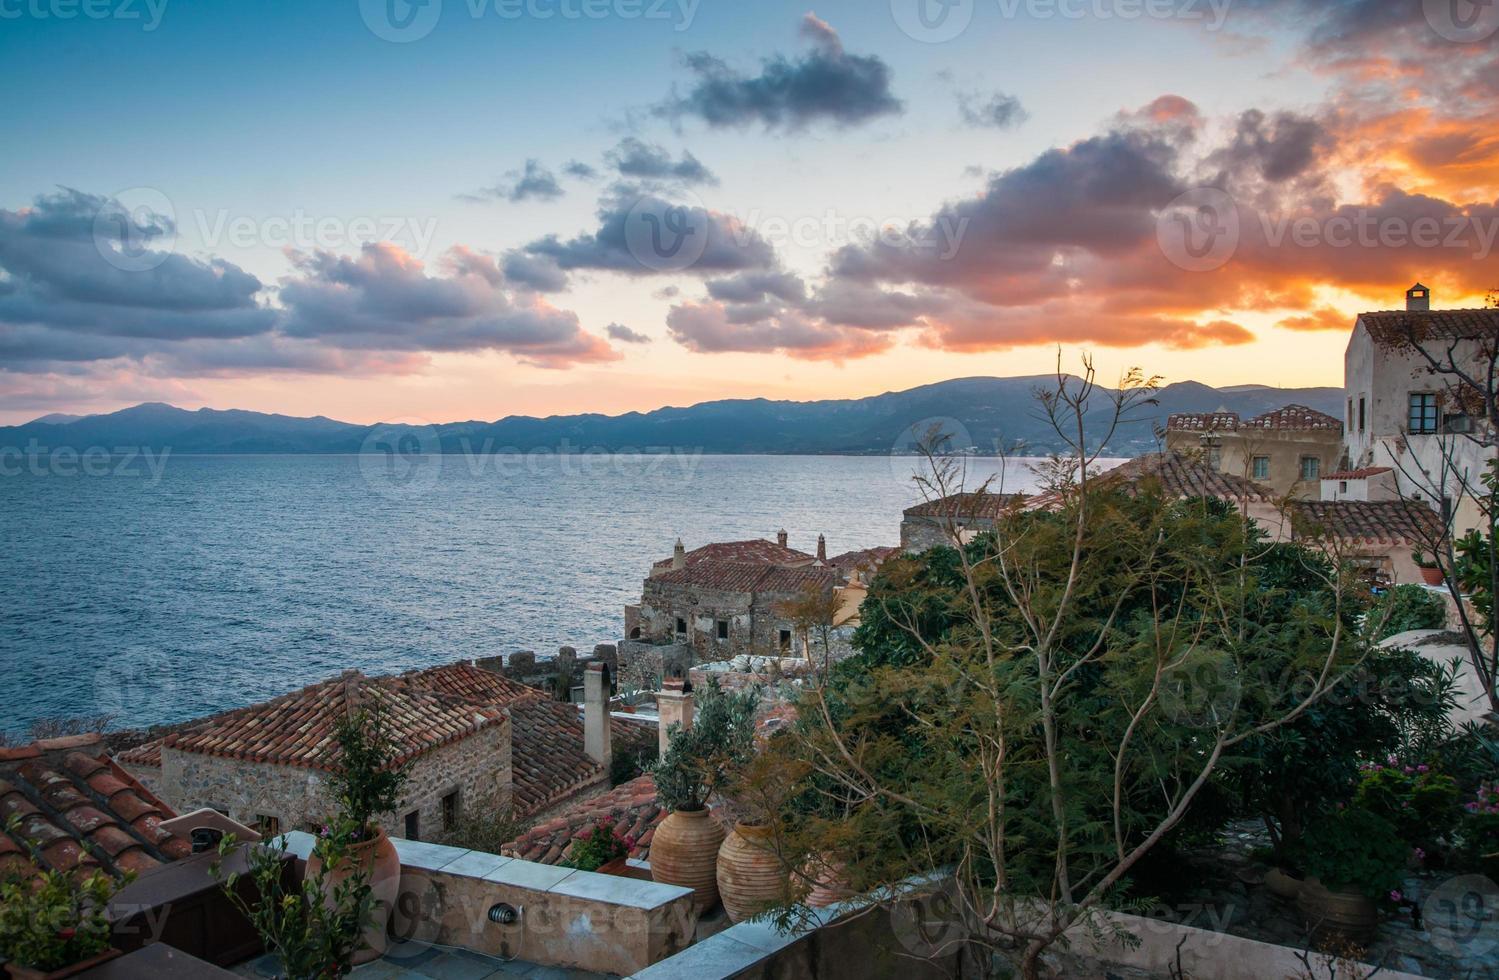 Cityscape at Monemvasia, Peloponnese, Greece photo